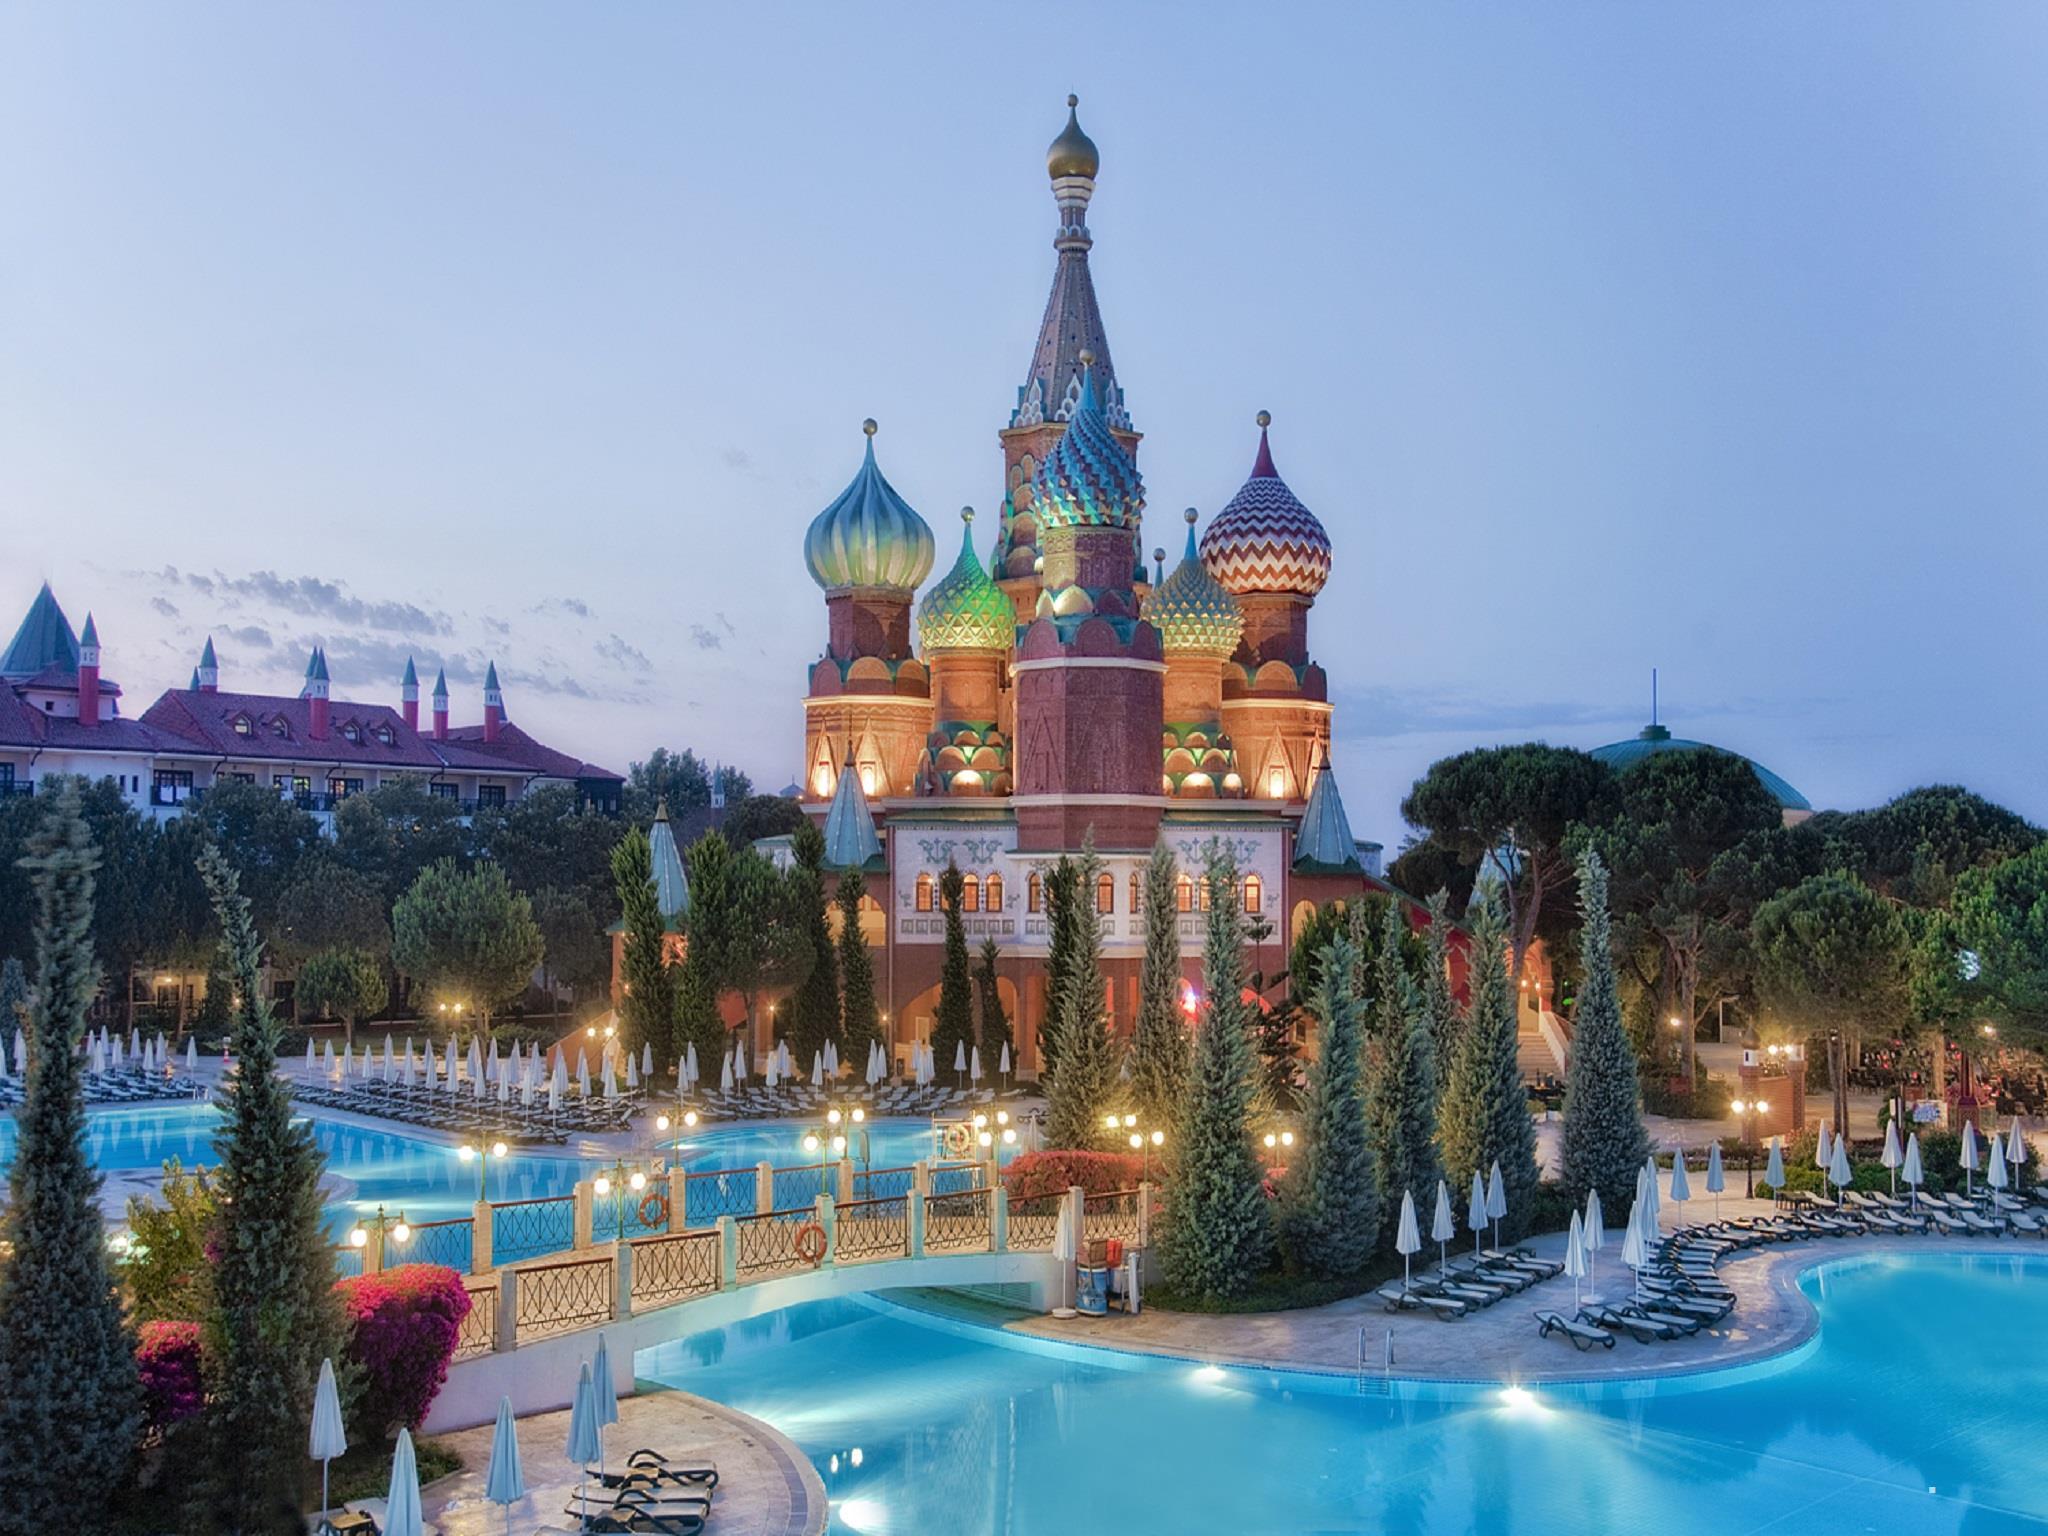 Отель WOW Kremlin Palace. Анталия, Турция.